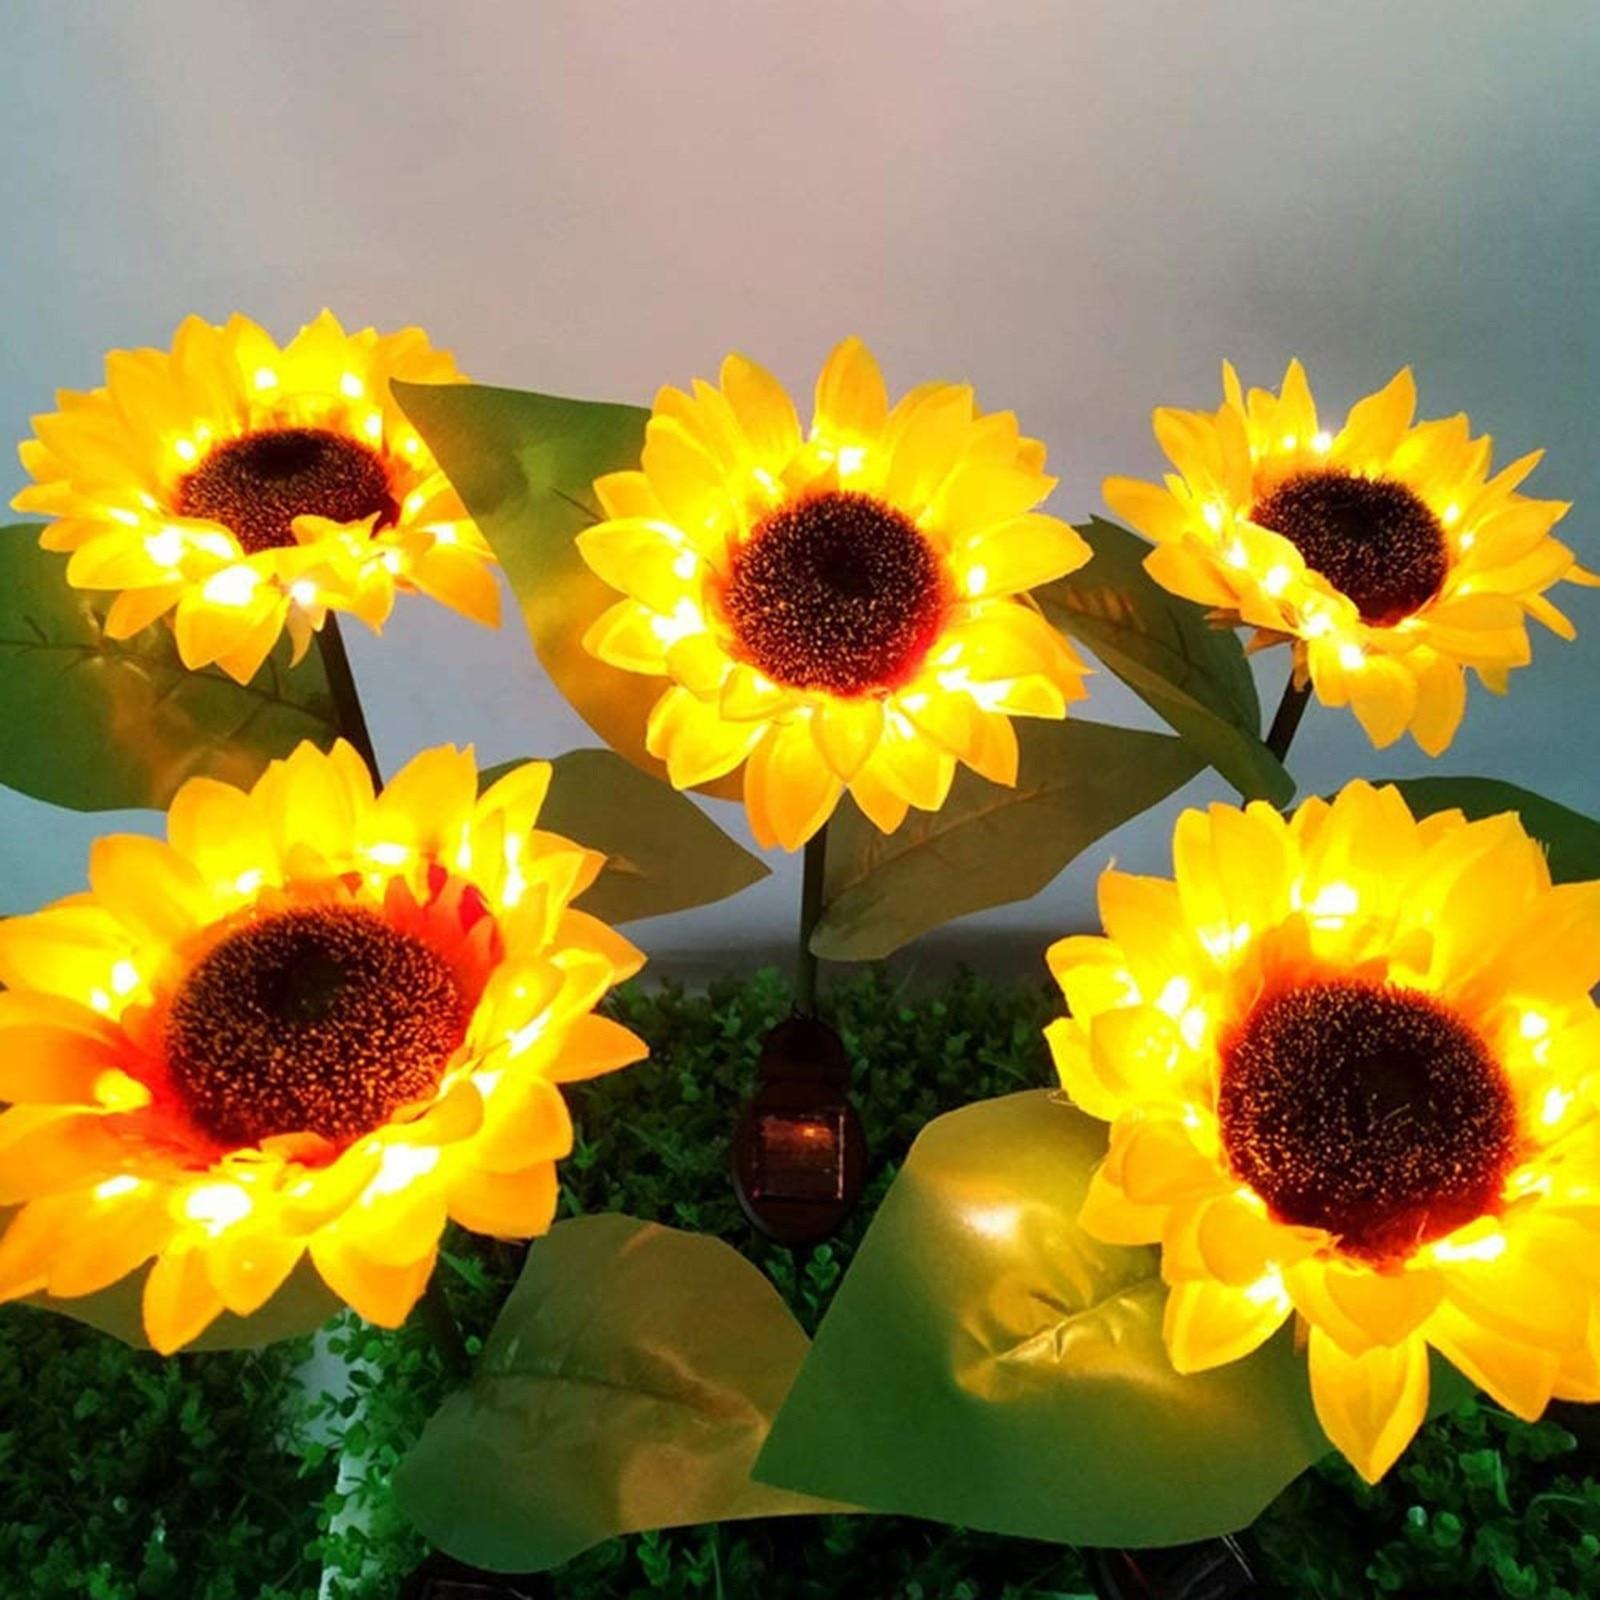 Luz Solar de girasol para exteriores, lámpara Led Solar de jardín y...